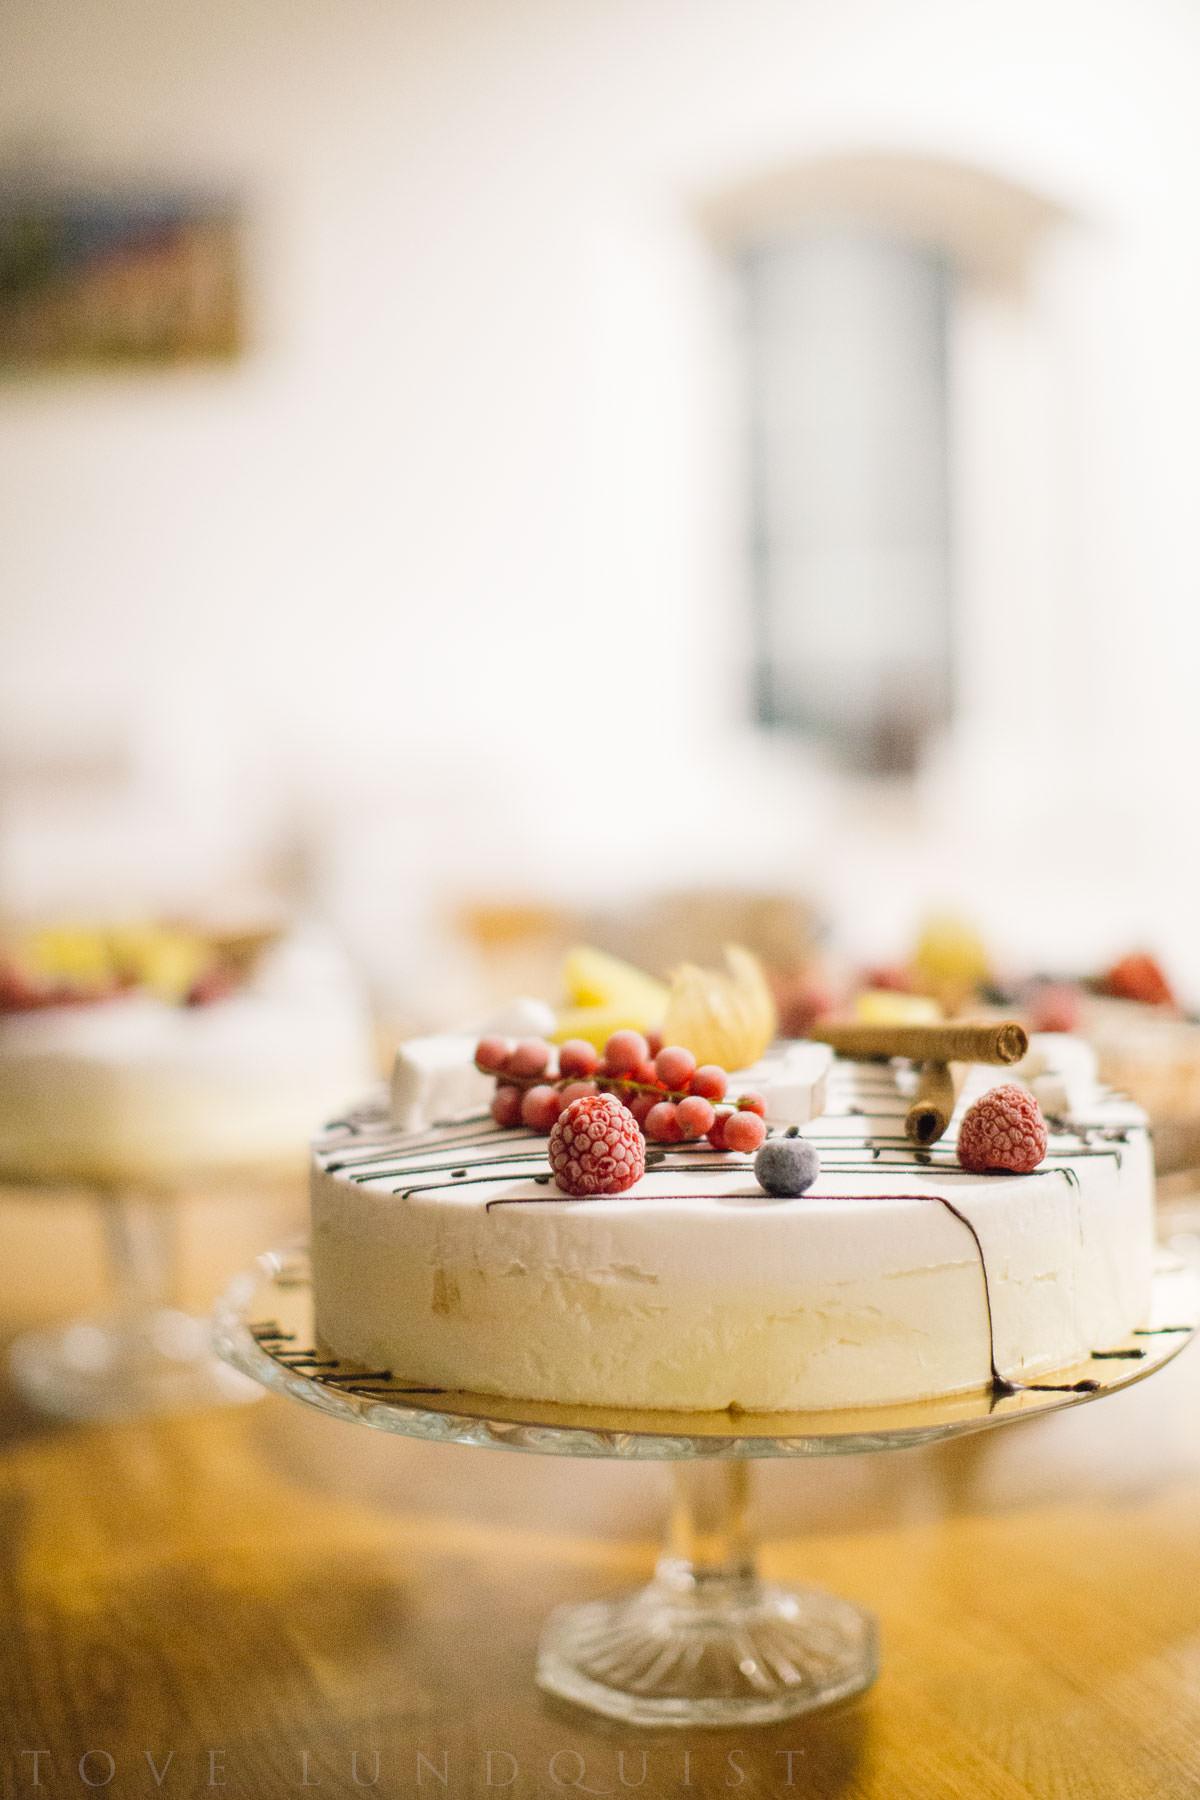 Glasstårta från Dolce Sicilia, Malmö.